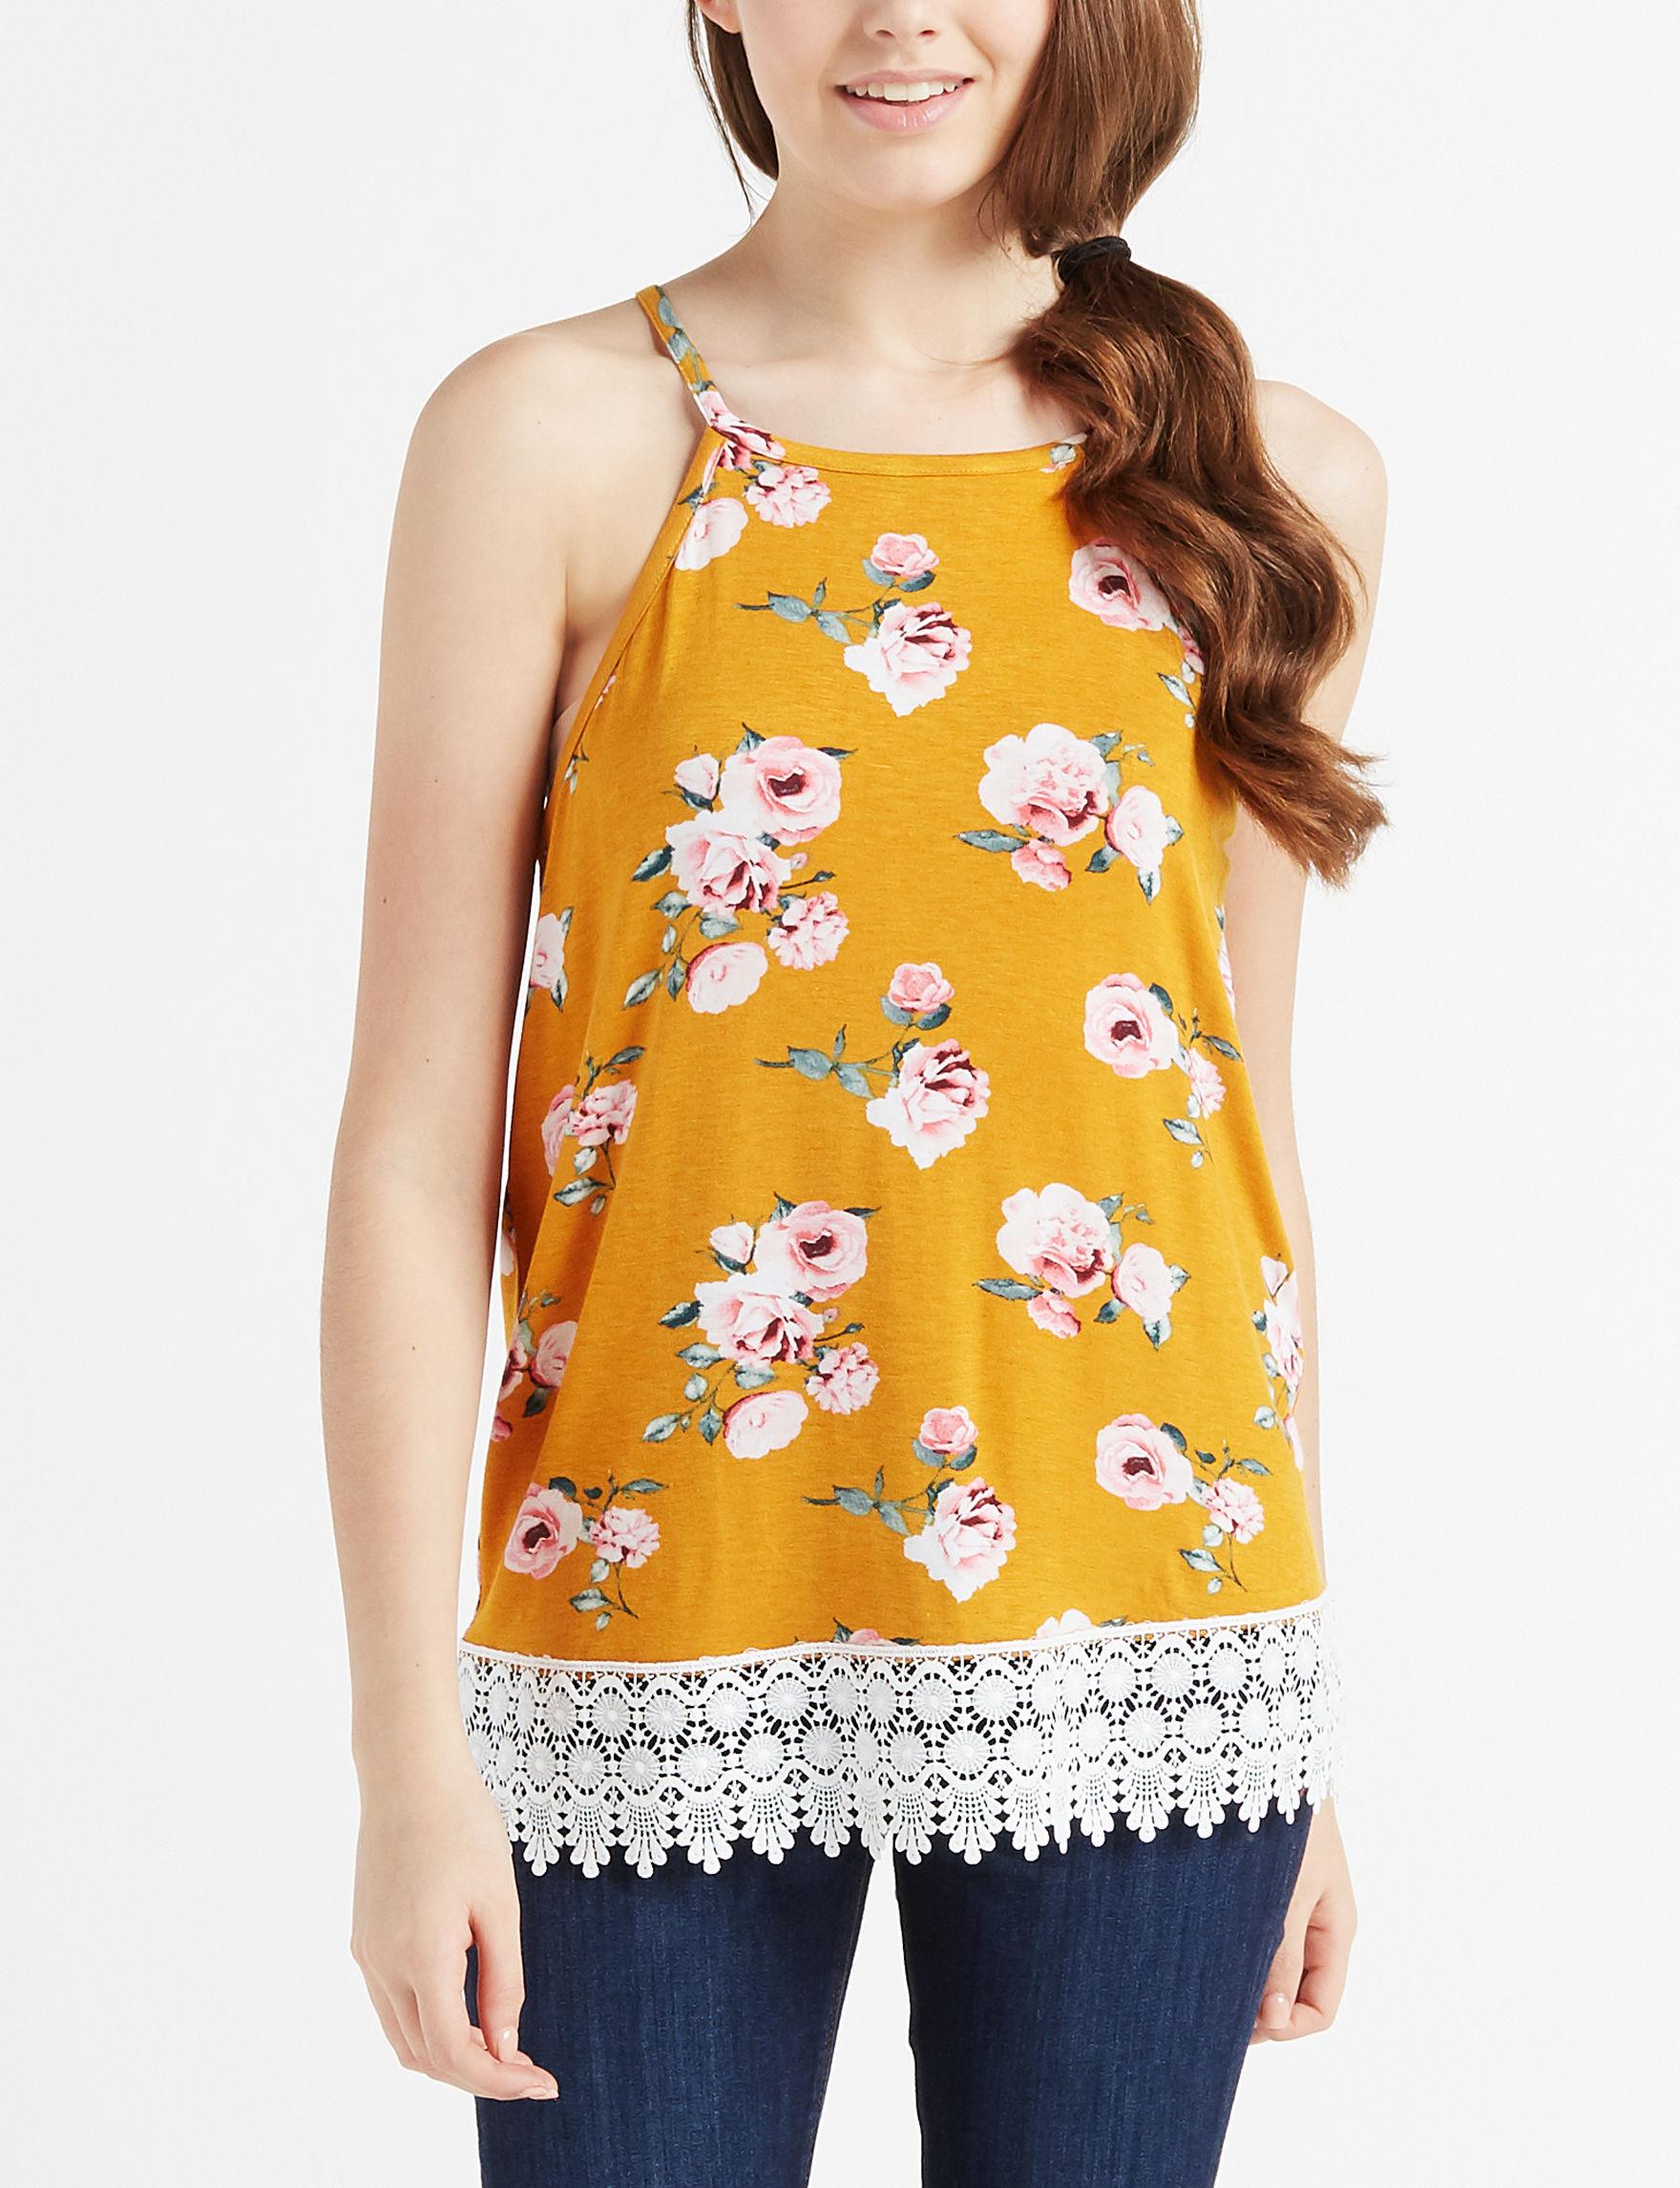 Wishful Park Mustard Floral Shirts & Blouses